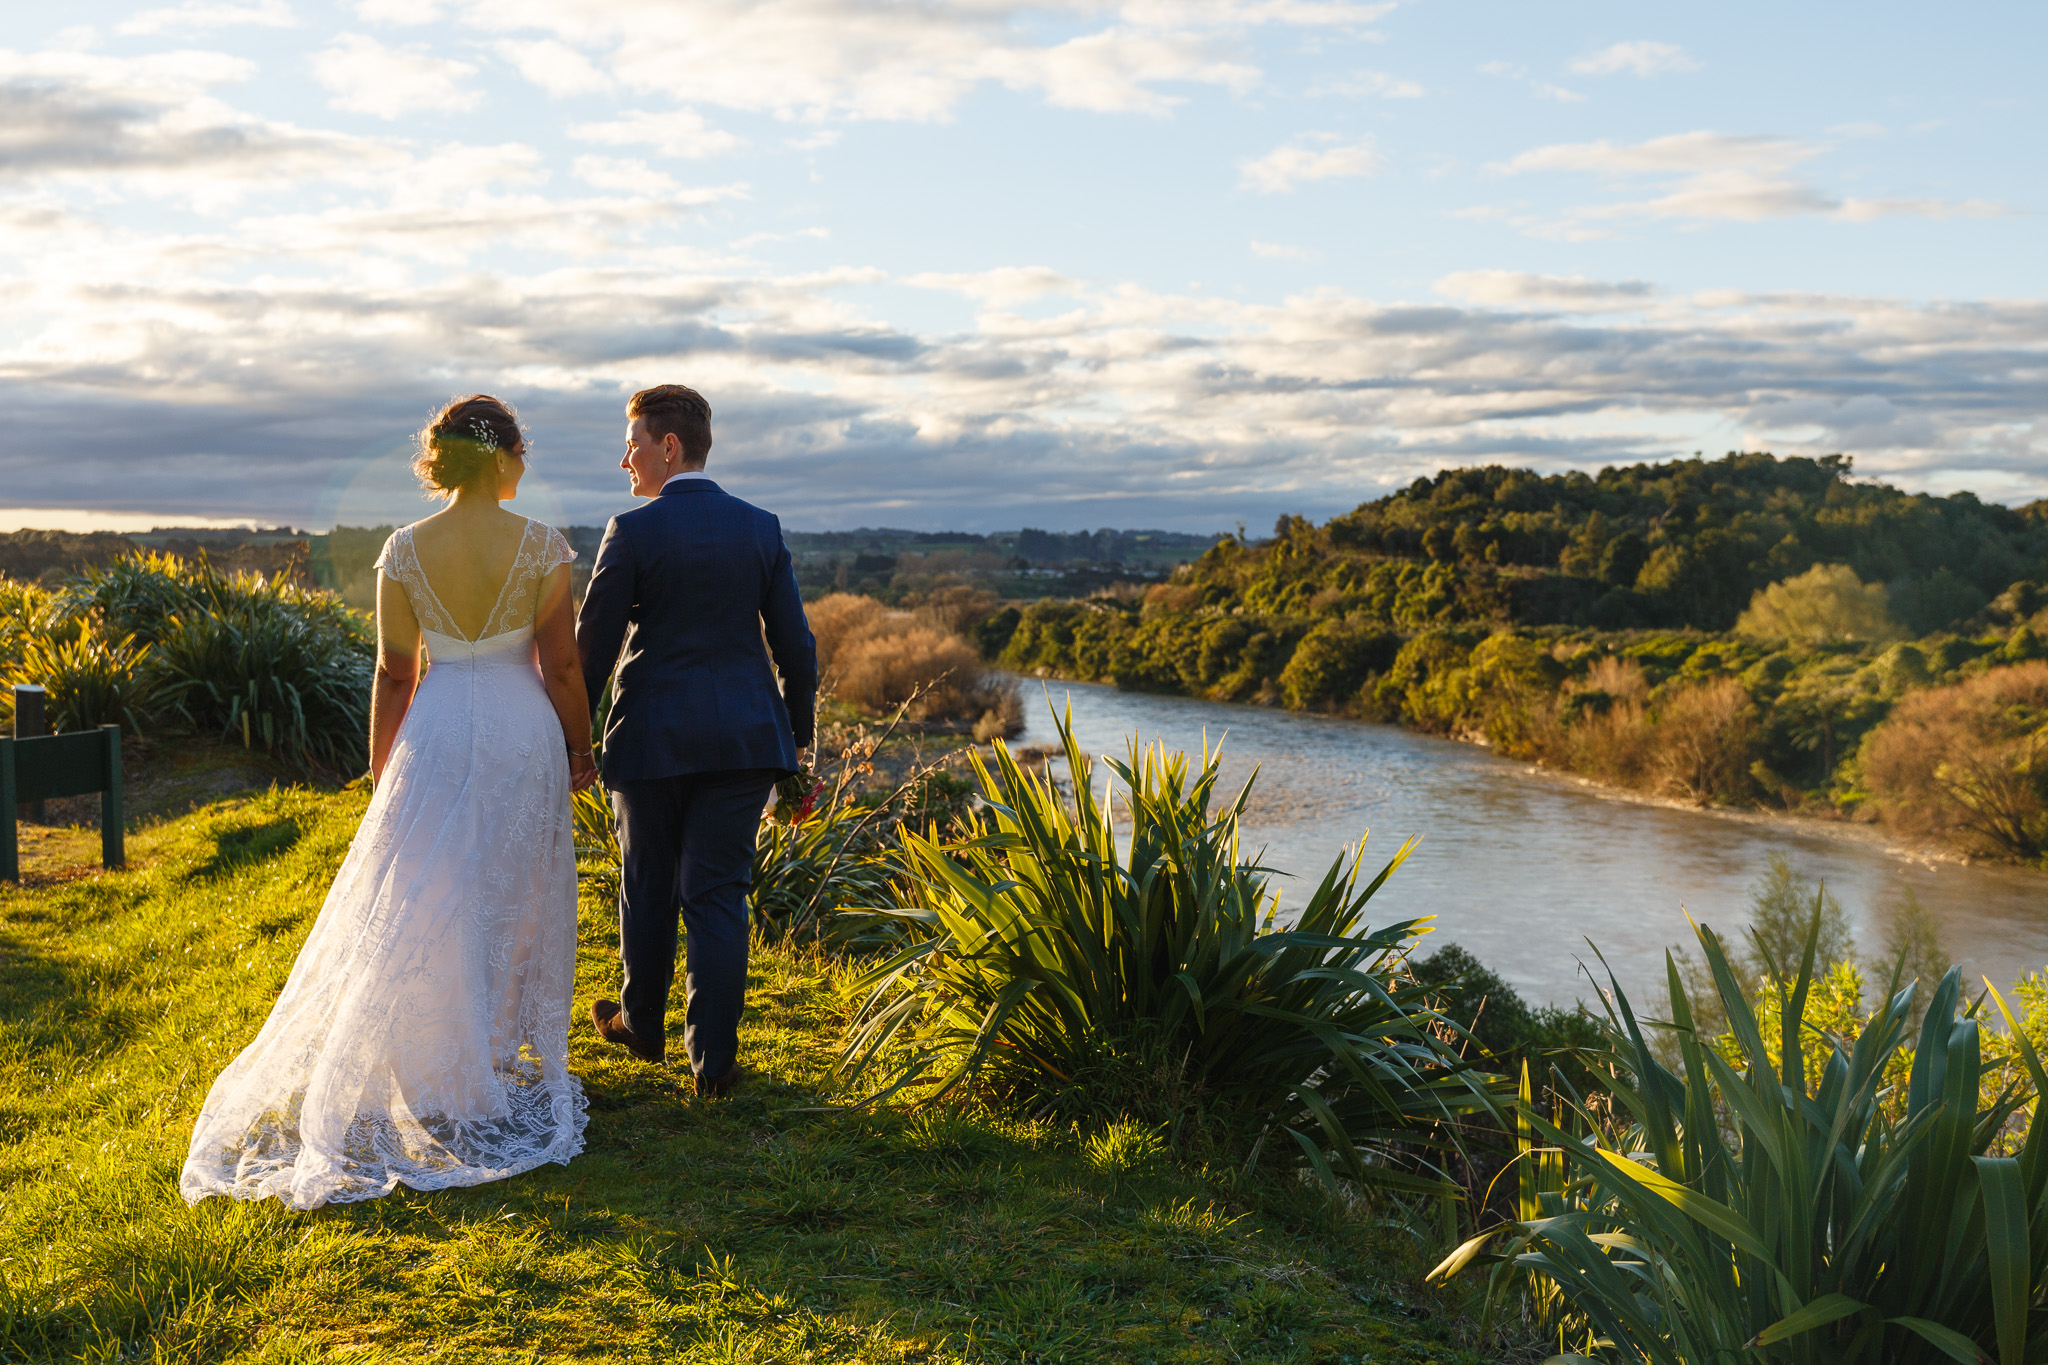 palmerston-north-wedding-photography-highlight-new-zealand.jpg-536.jpg